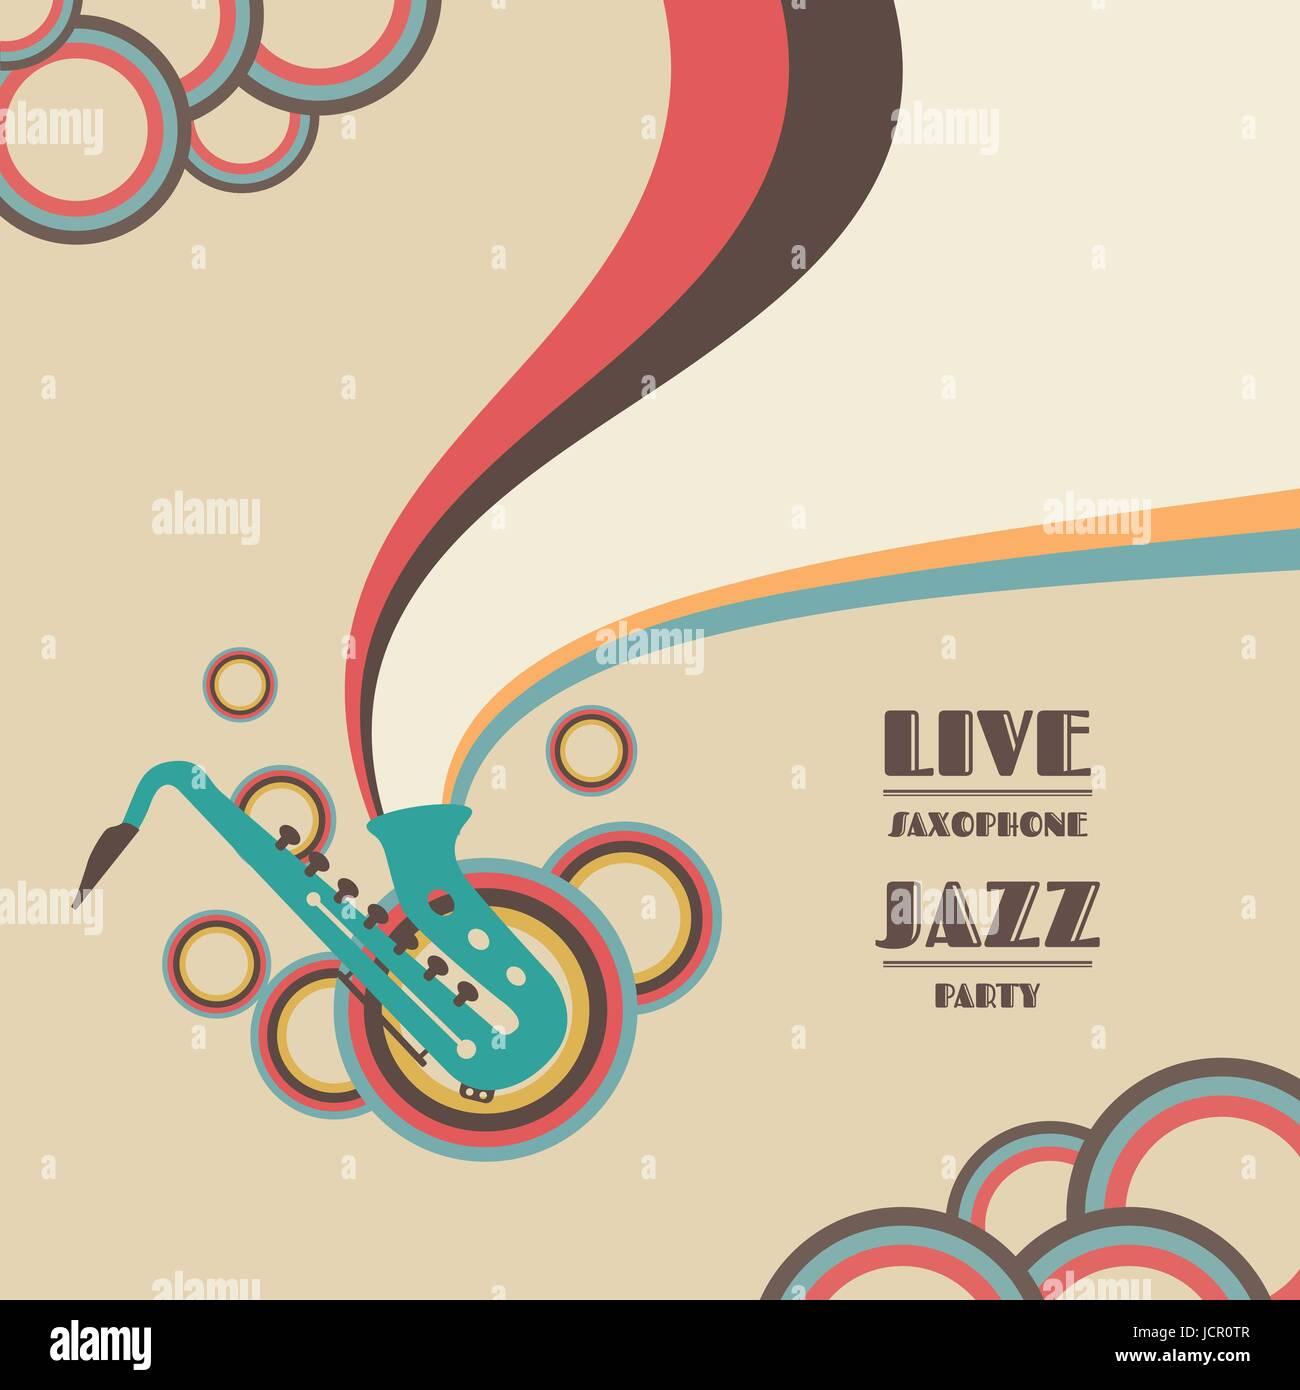 saxophone live show, jazz music concert - Stock Image